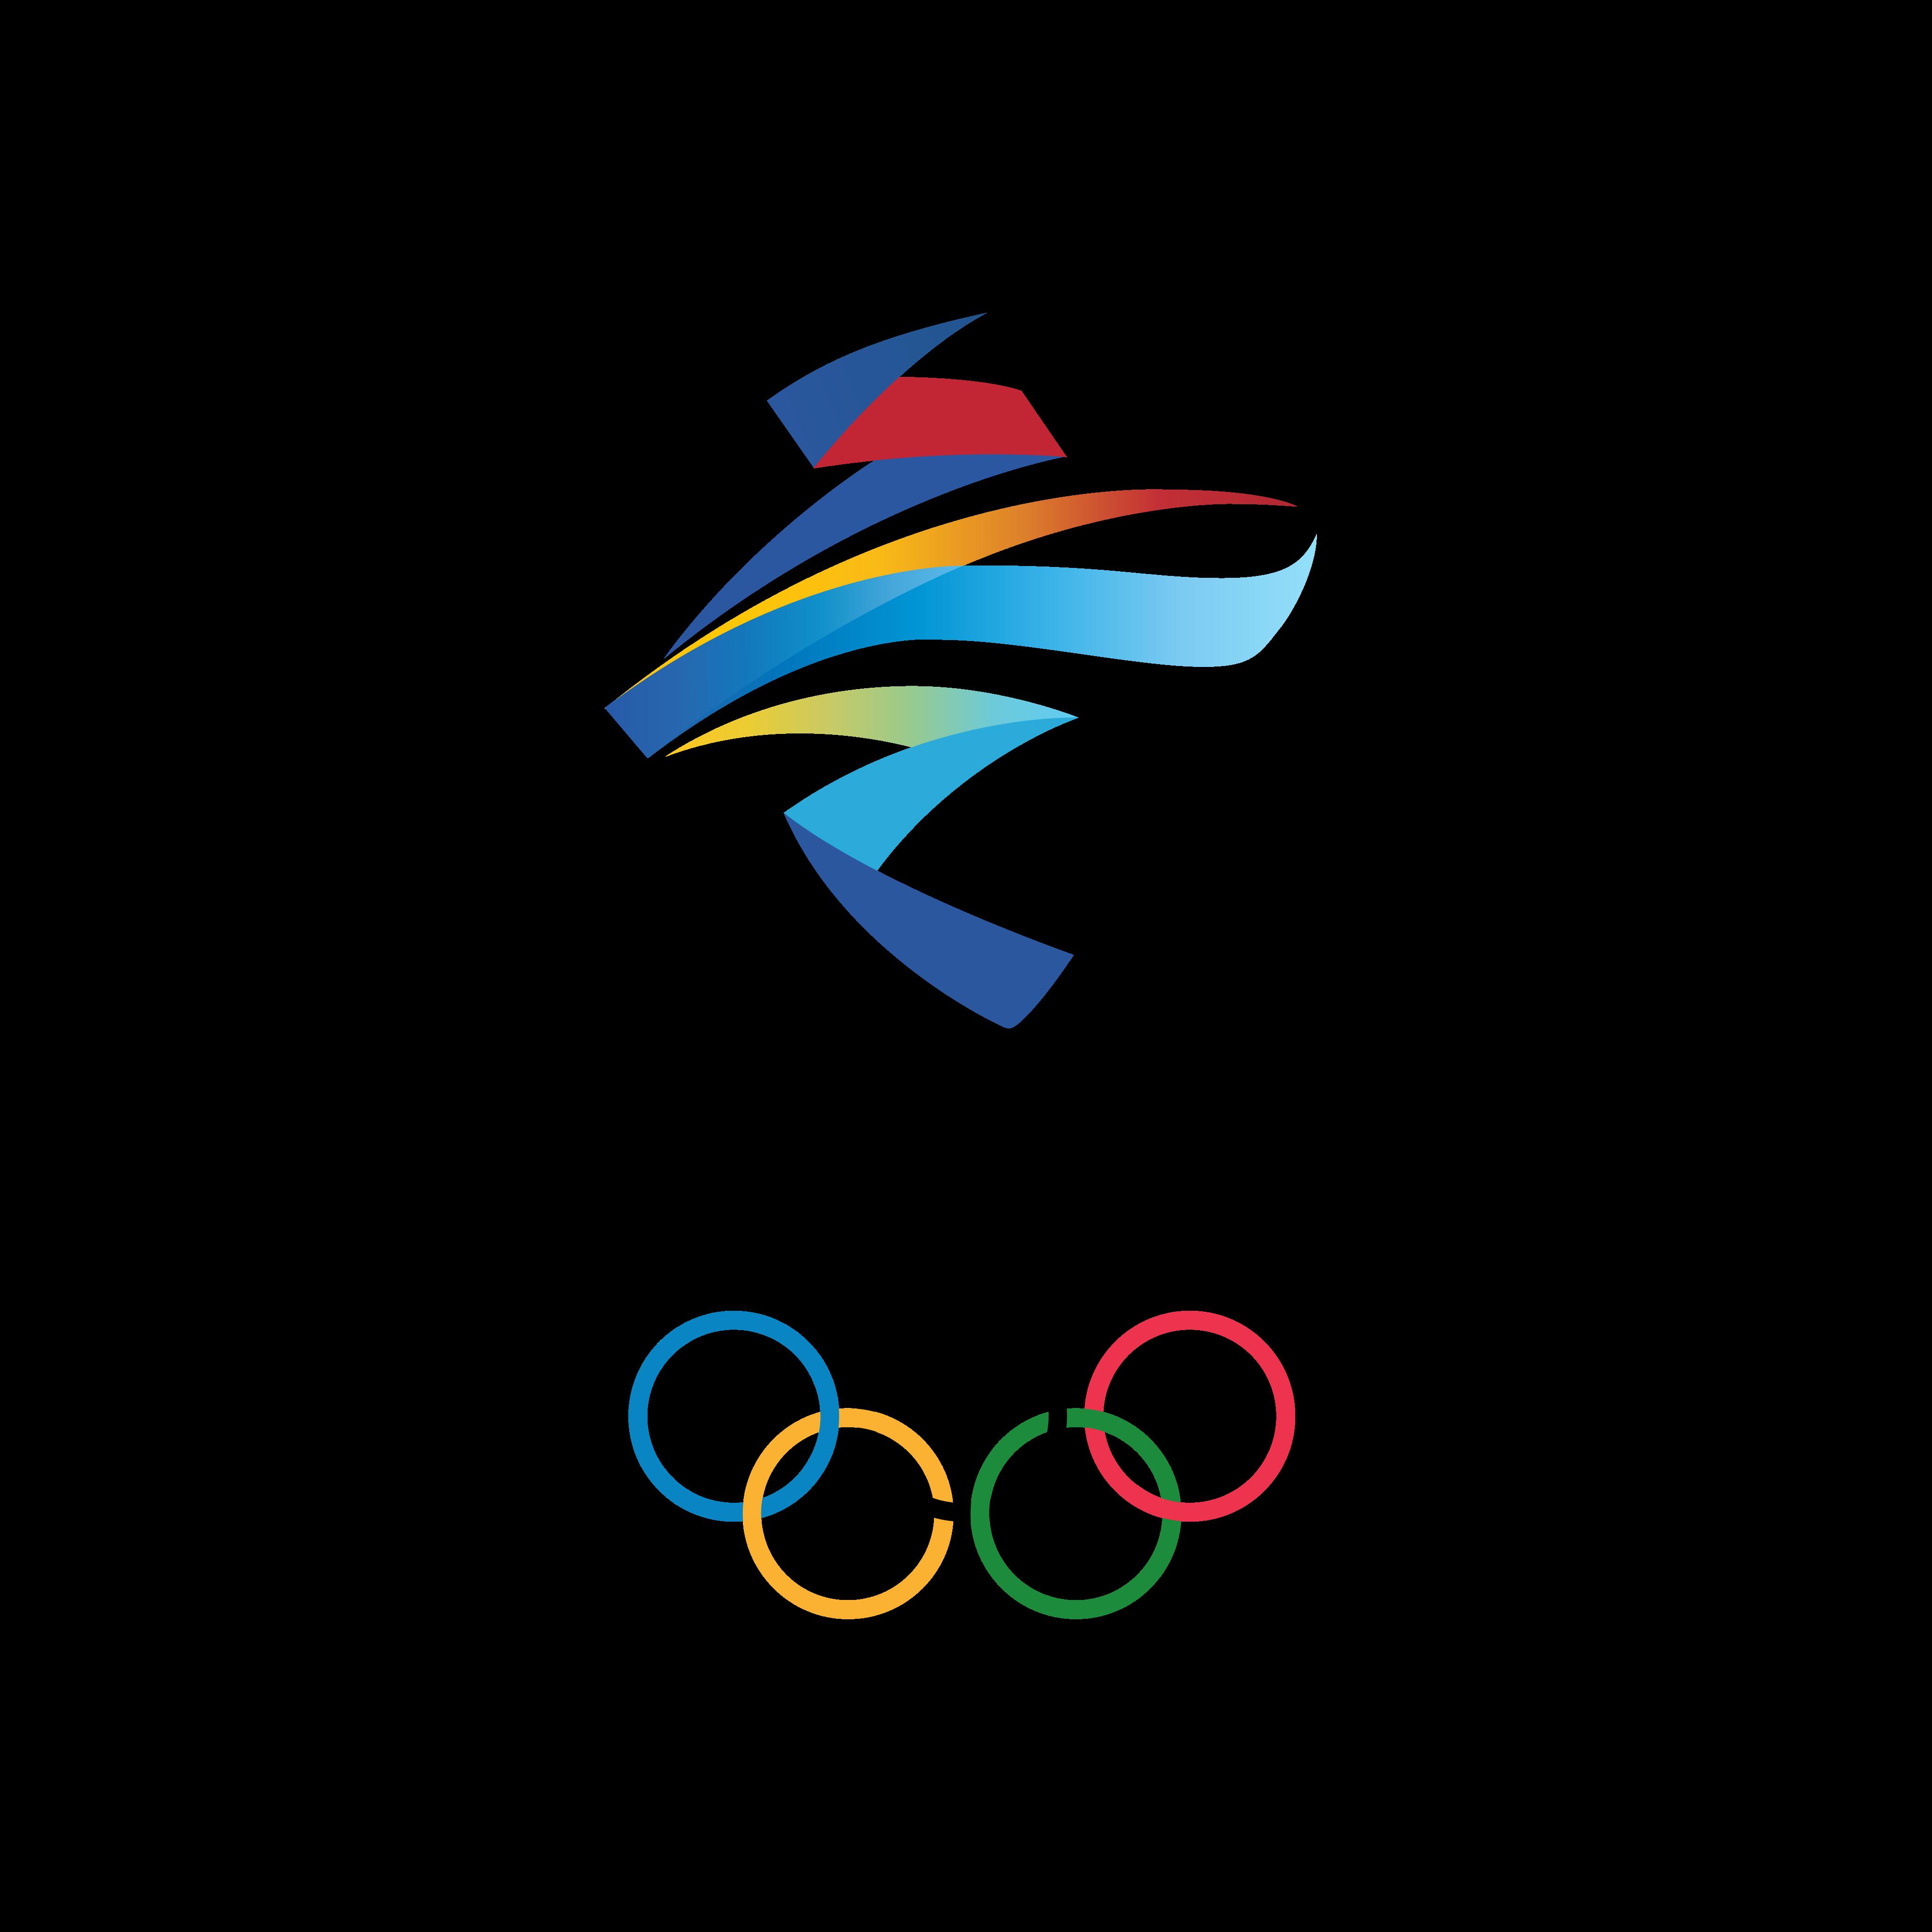 beijing 2022 logo 0 - Beijing 2022 Logo